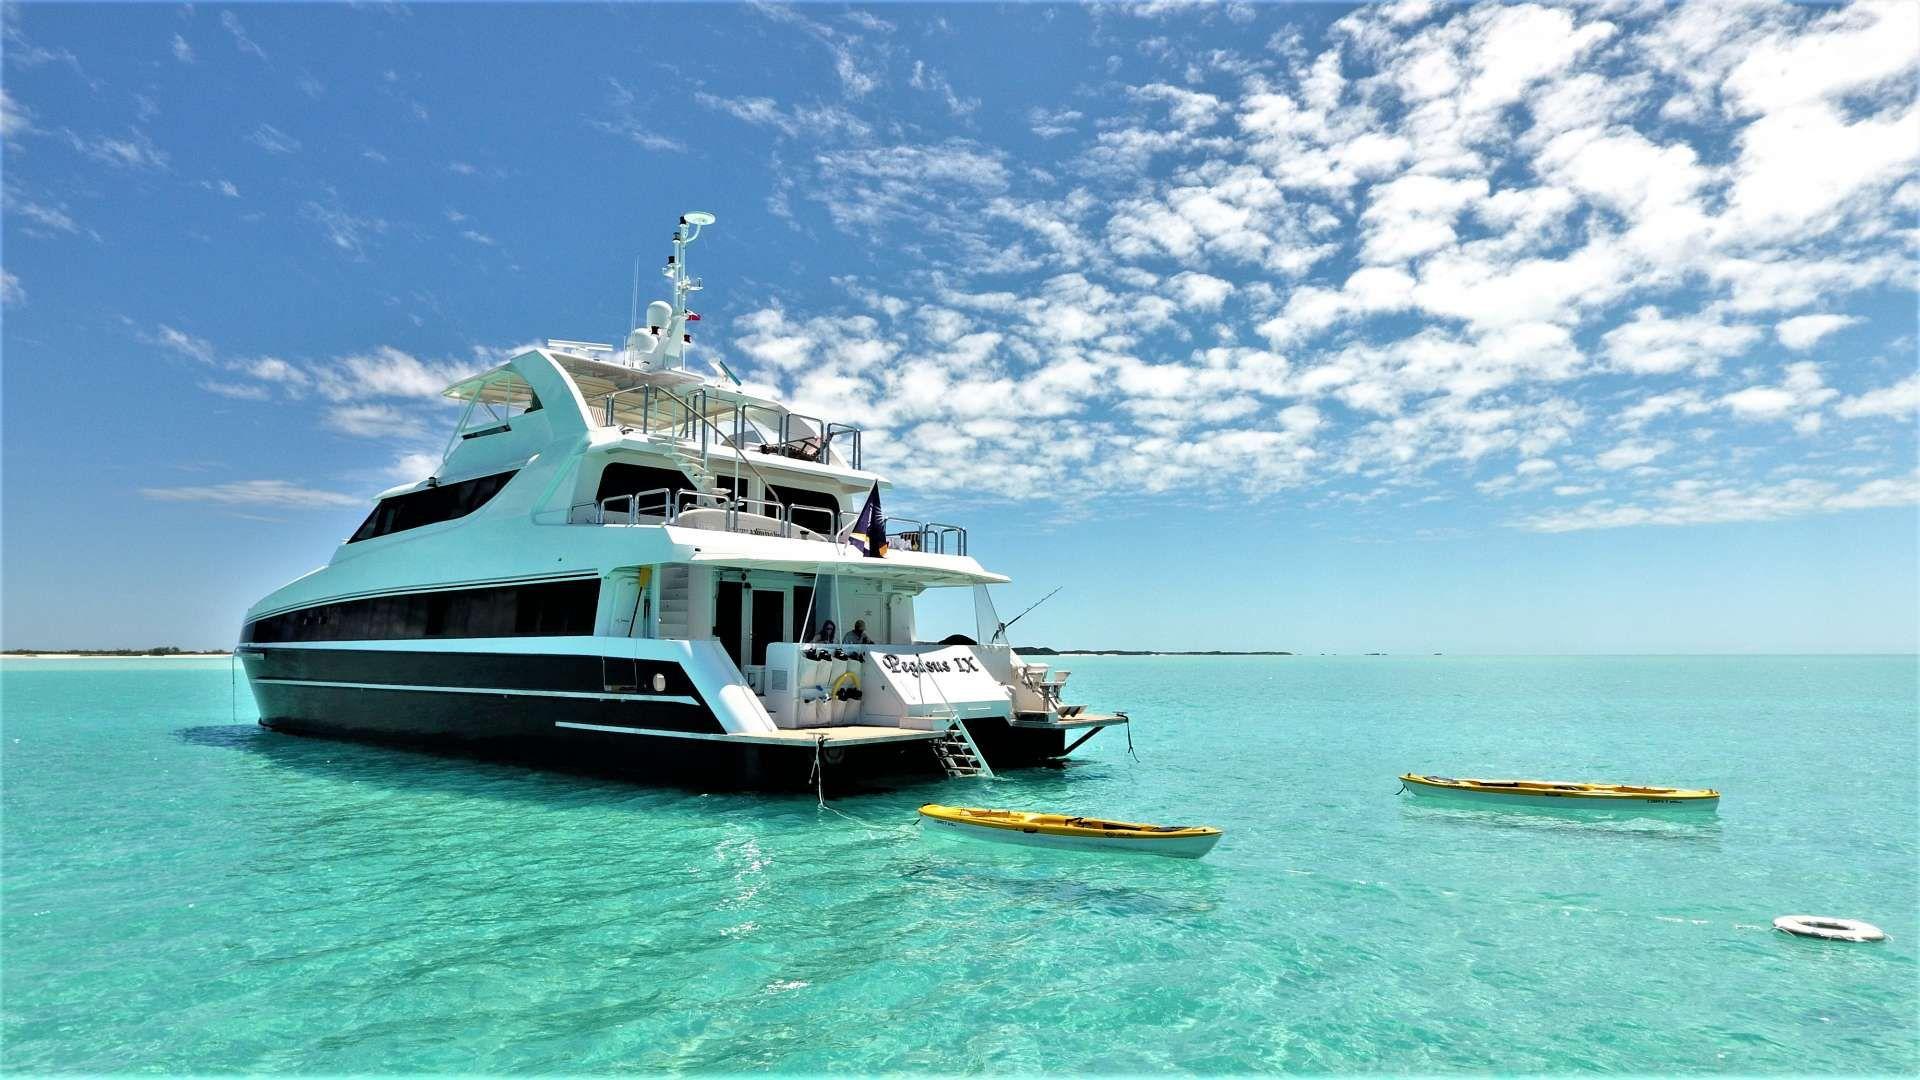 PEGASUS IX - Custom Cutter Catamaran - 3 Cabins - Nassau the Bahamas